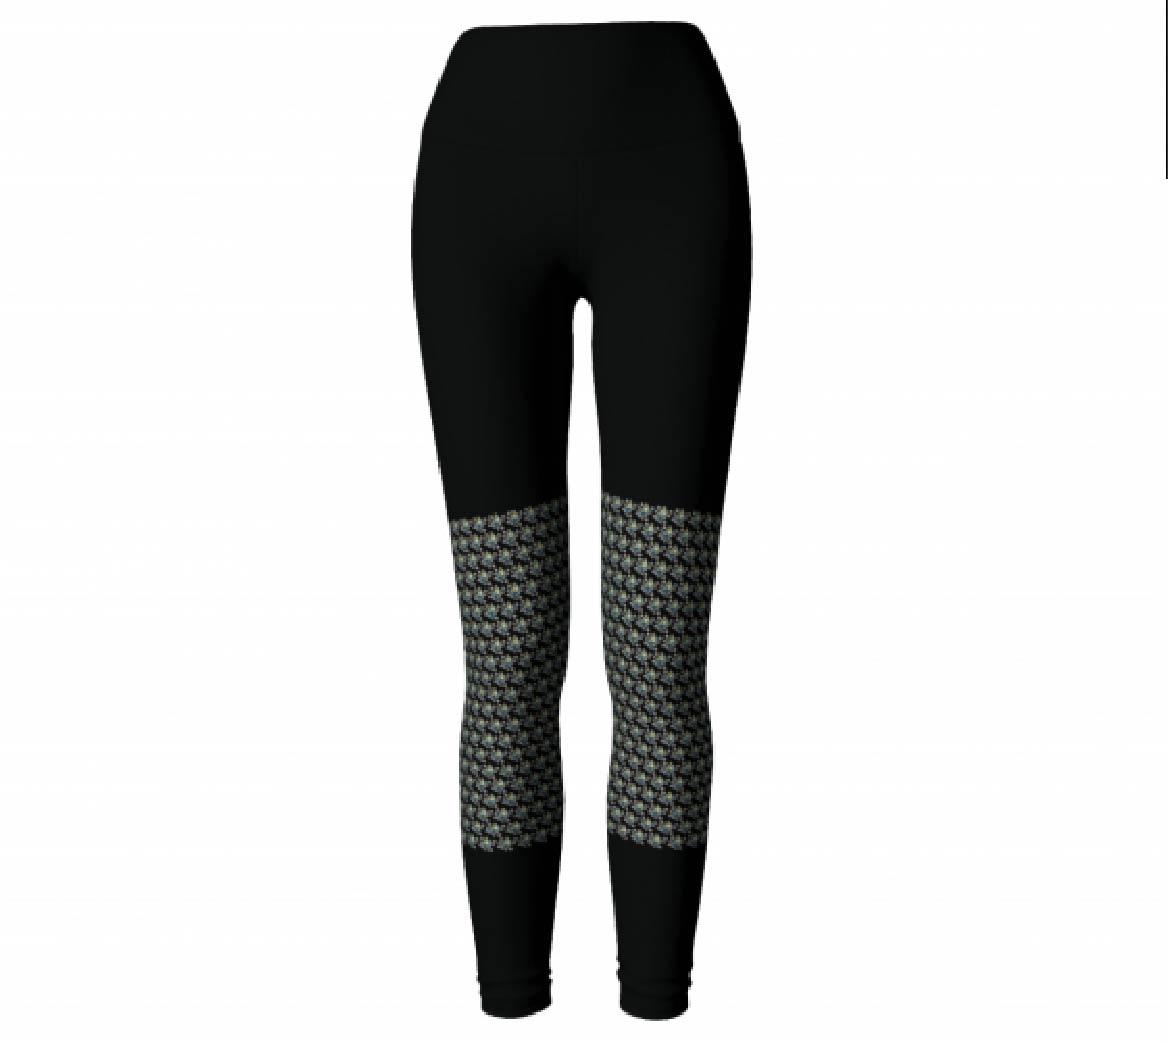 Black Leggings #2          $45